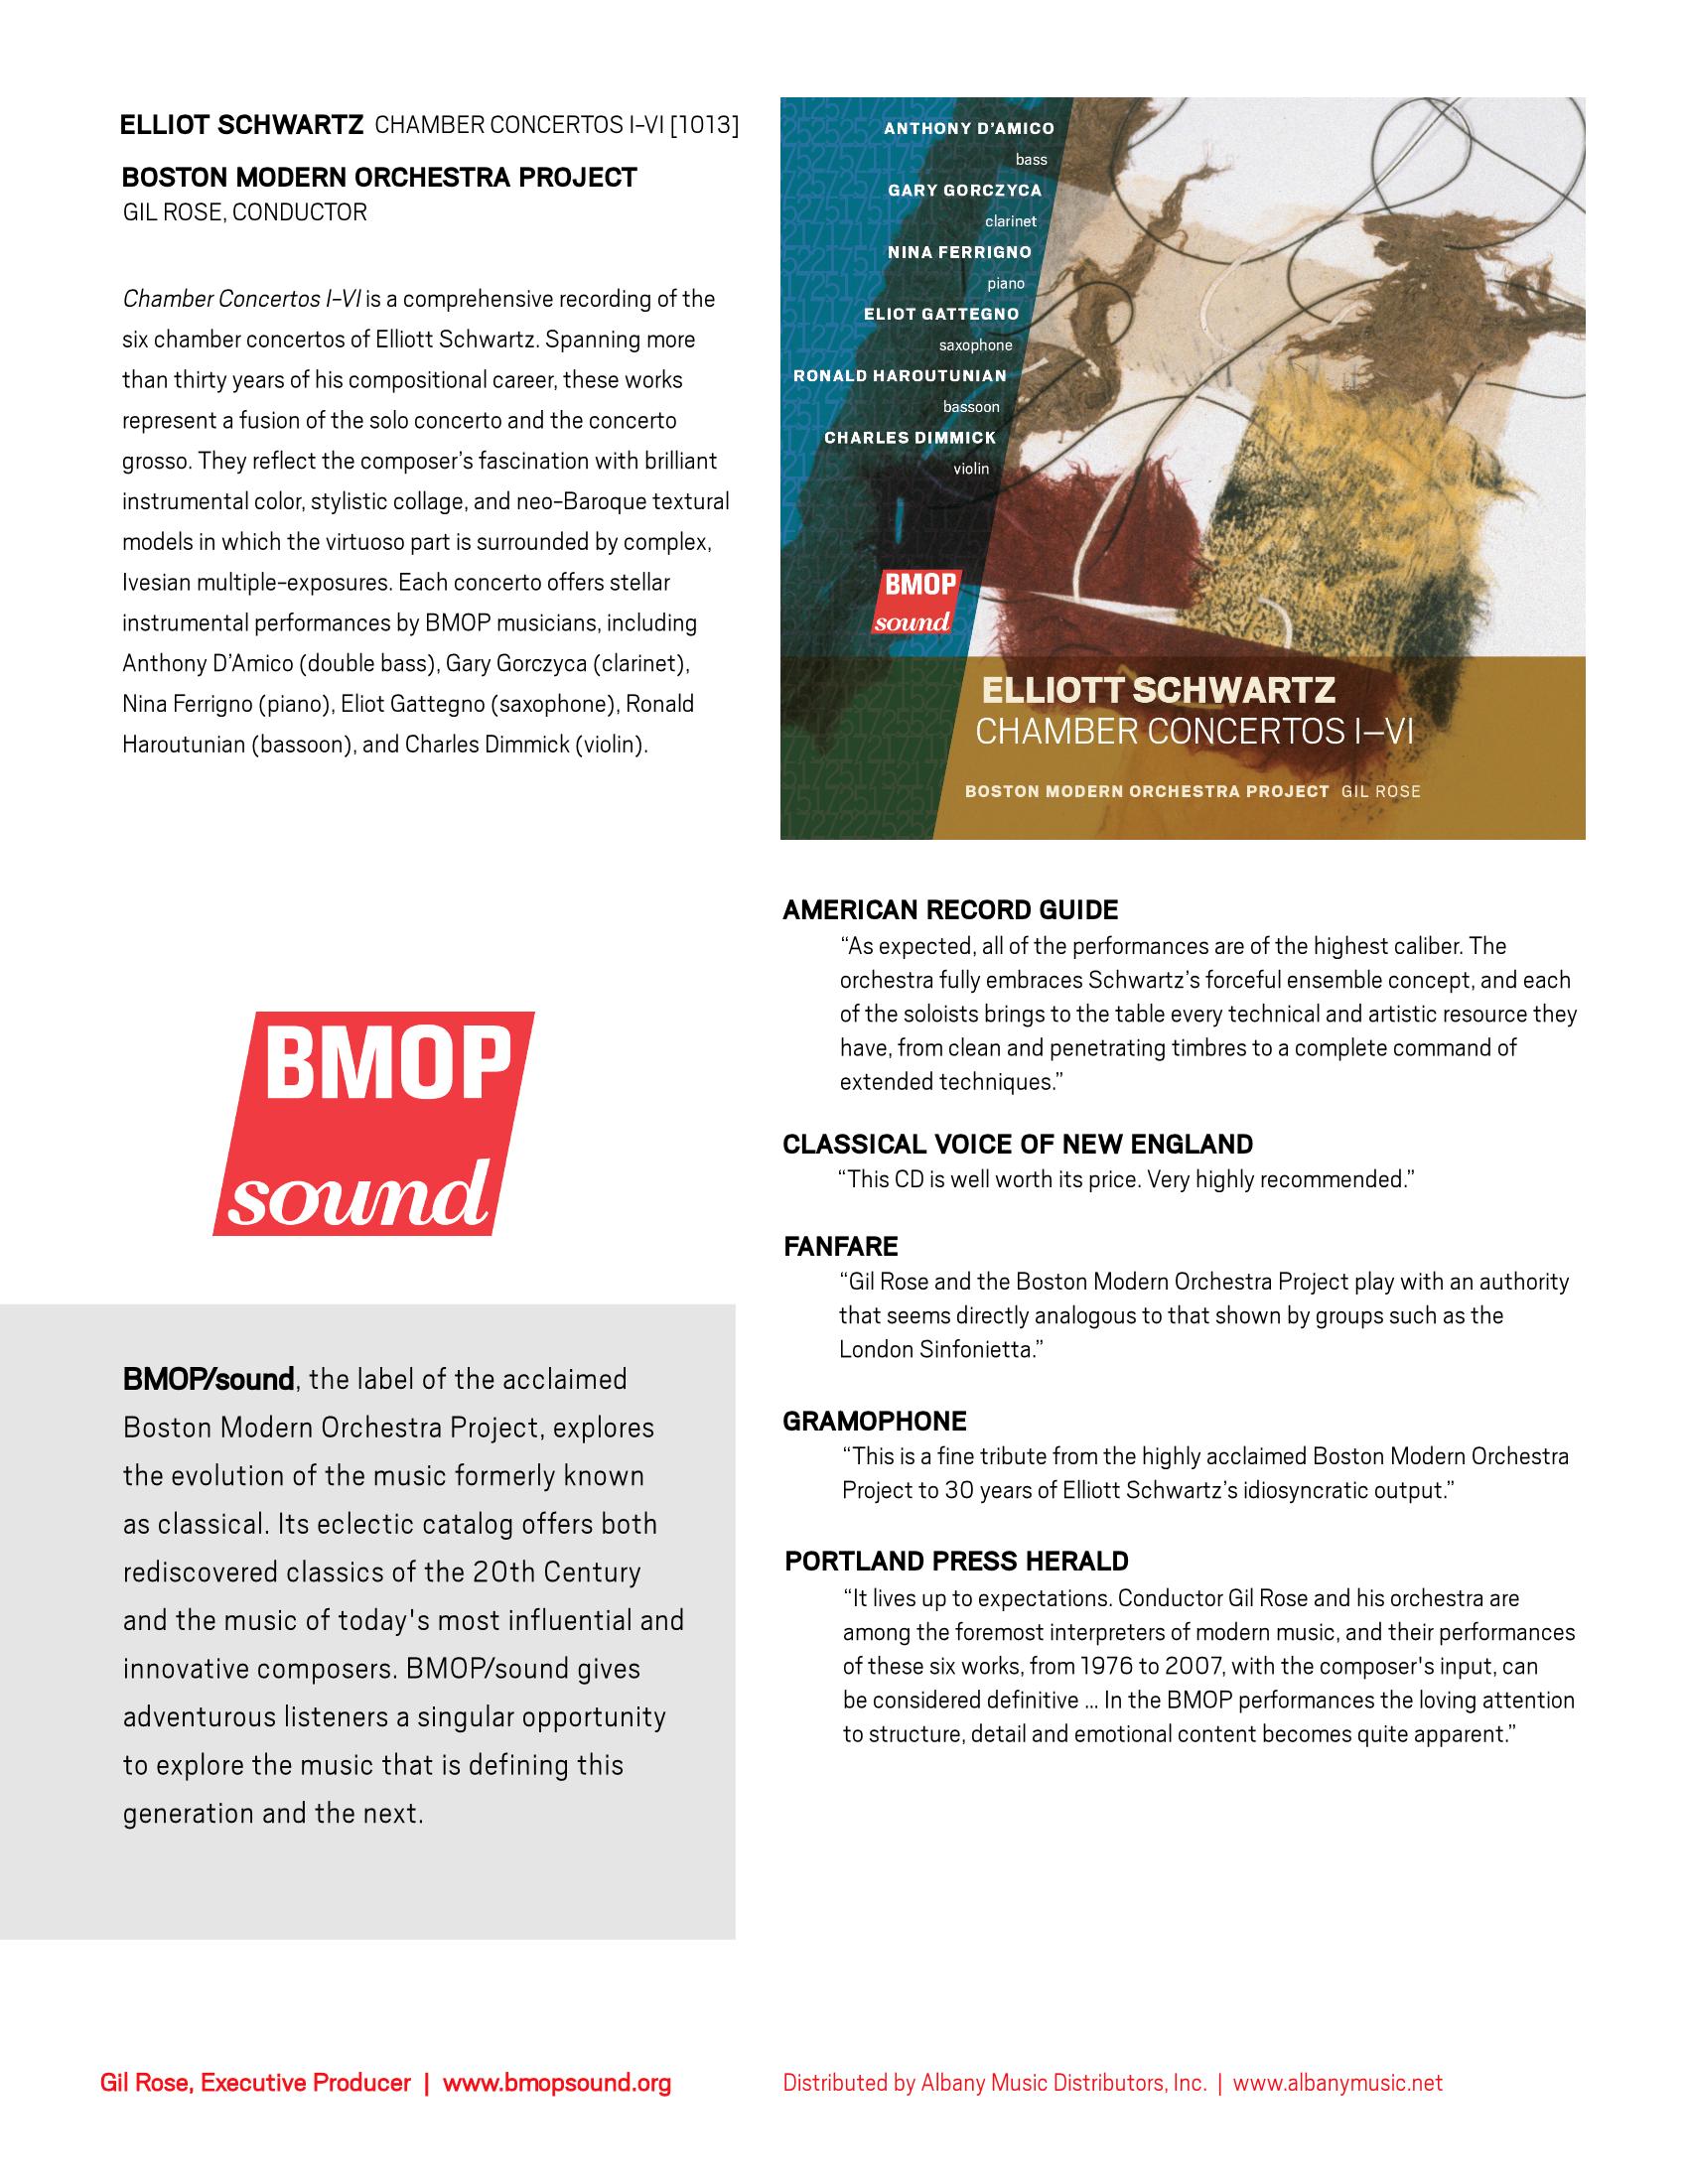 Schwartz - BMOPsound 1013 one-sheet.png